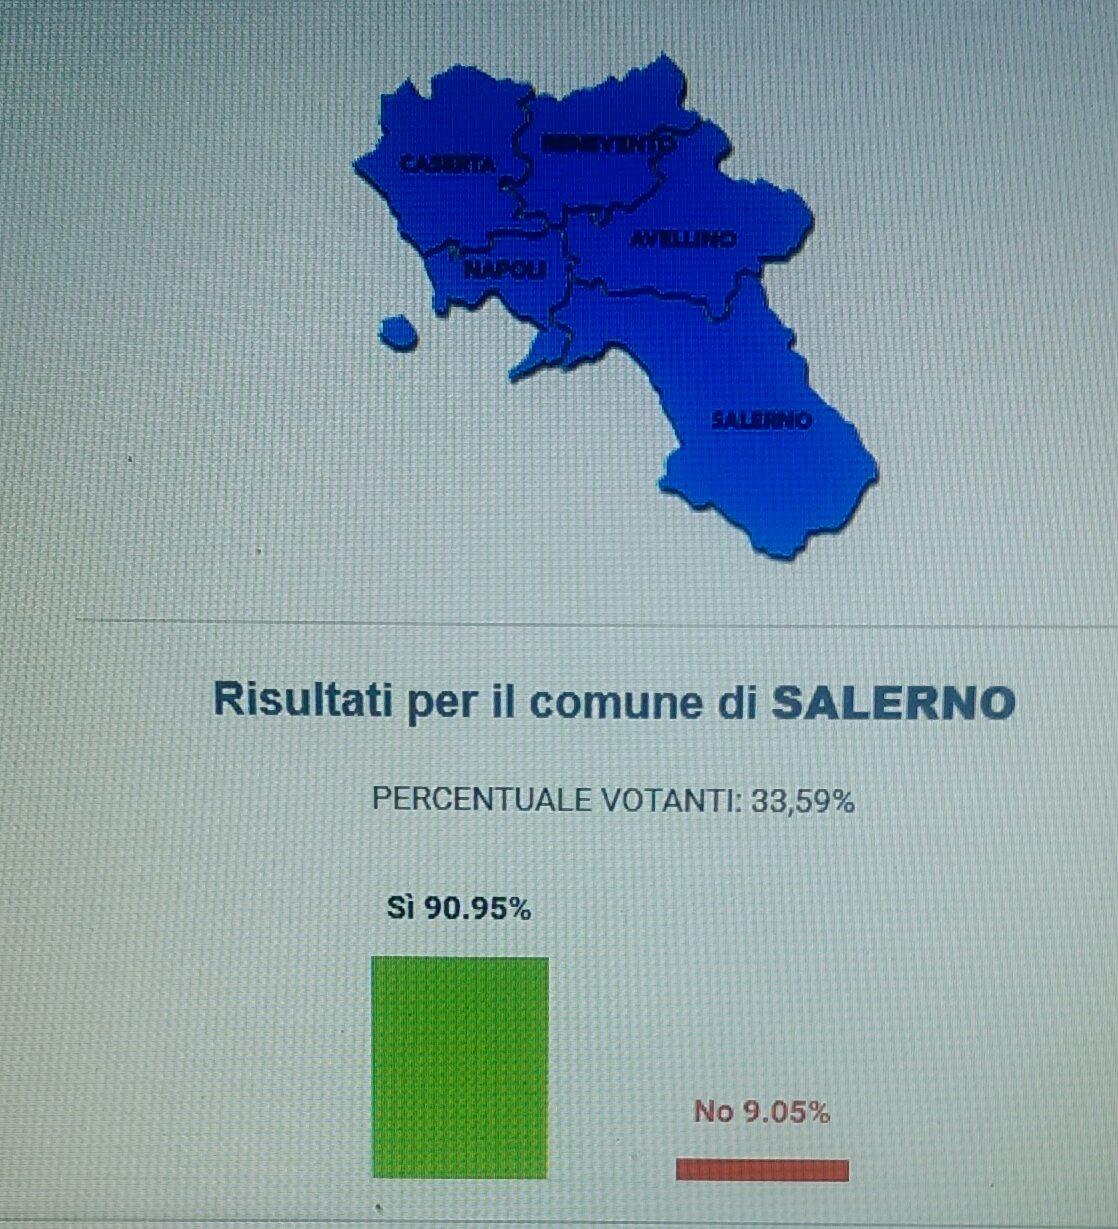 Referendum-Trivelle-dati Salerno